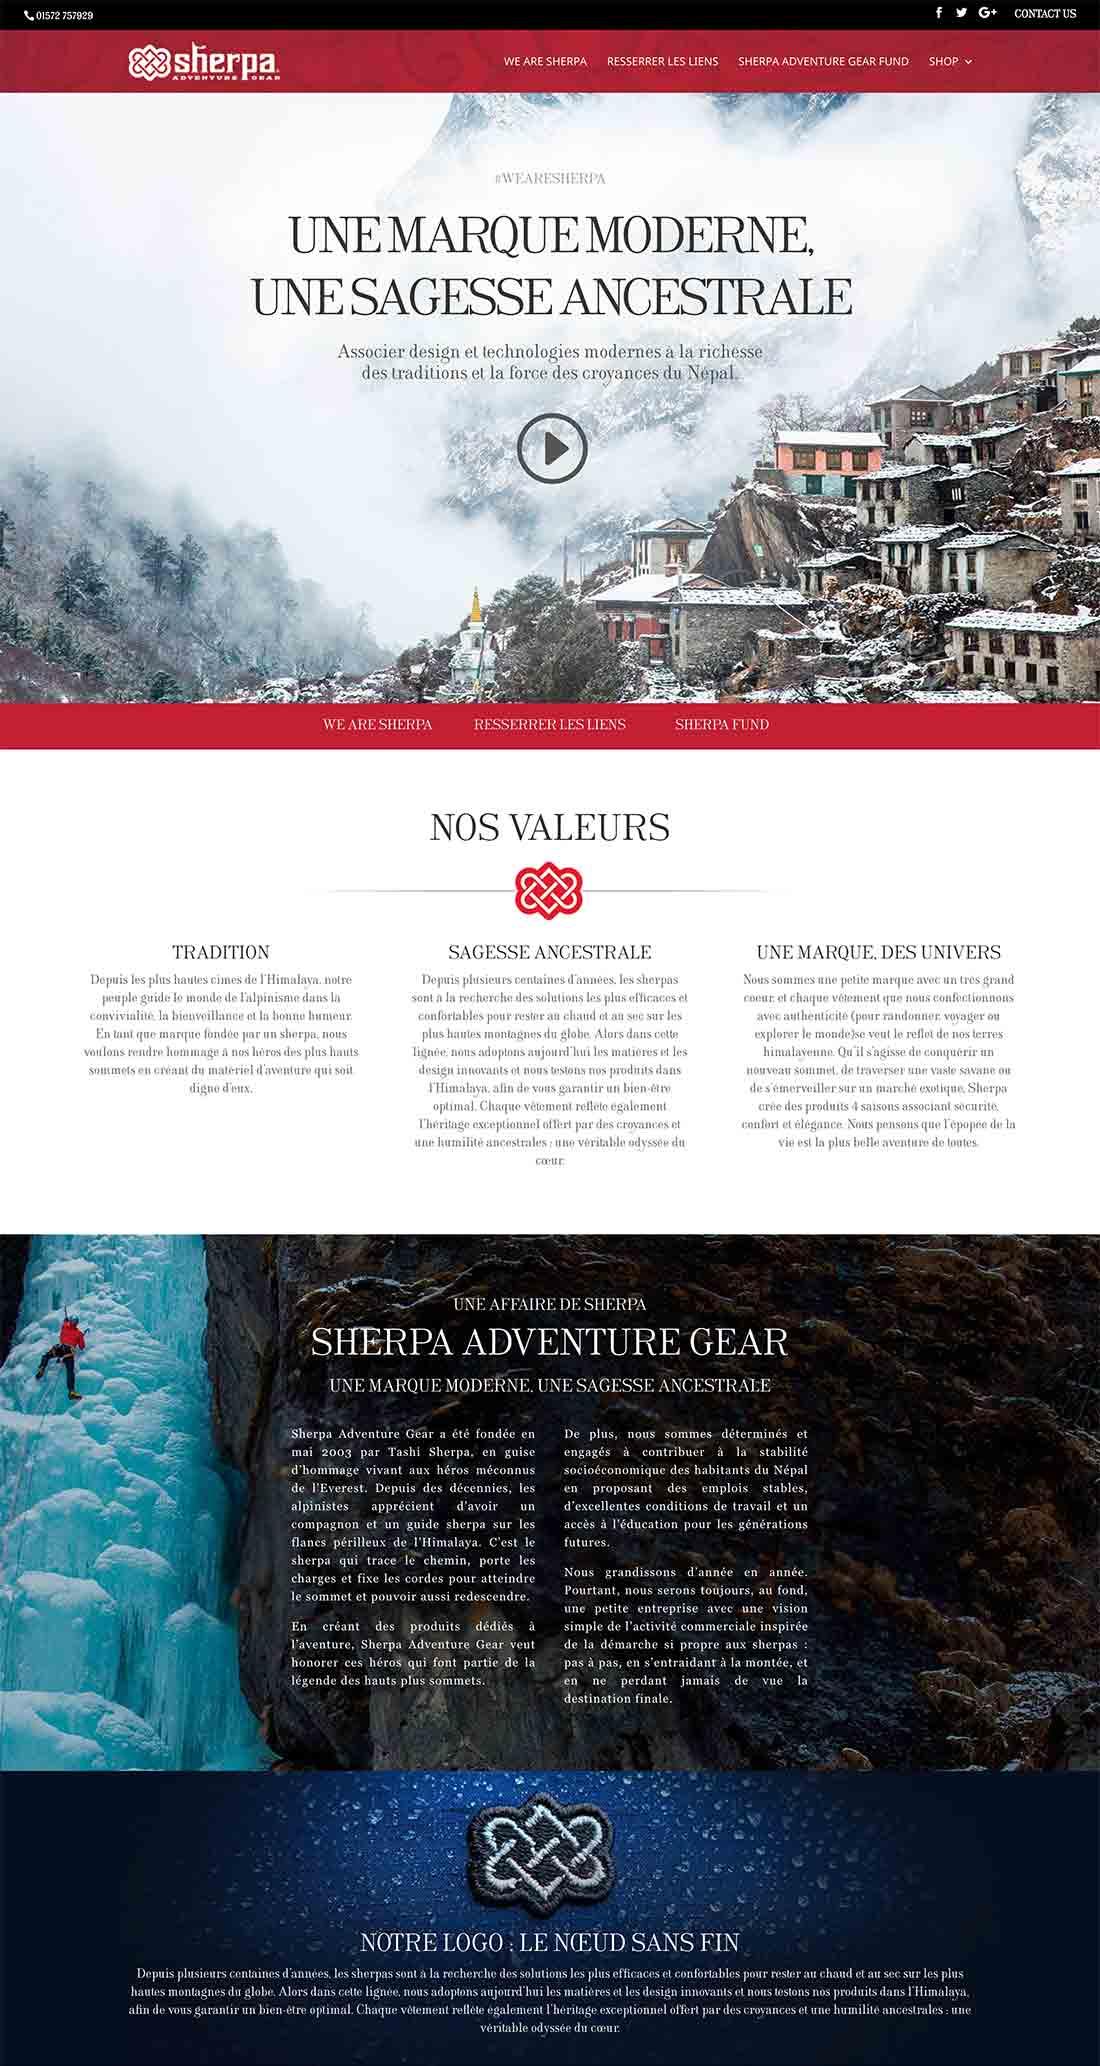 sherpaadventuregear.fr homepage design